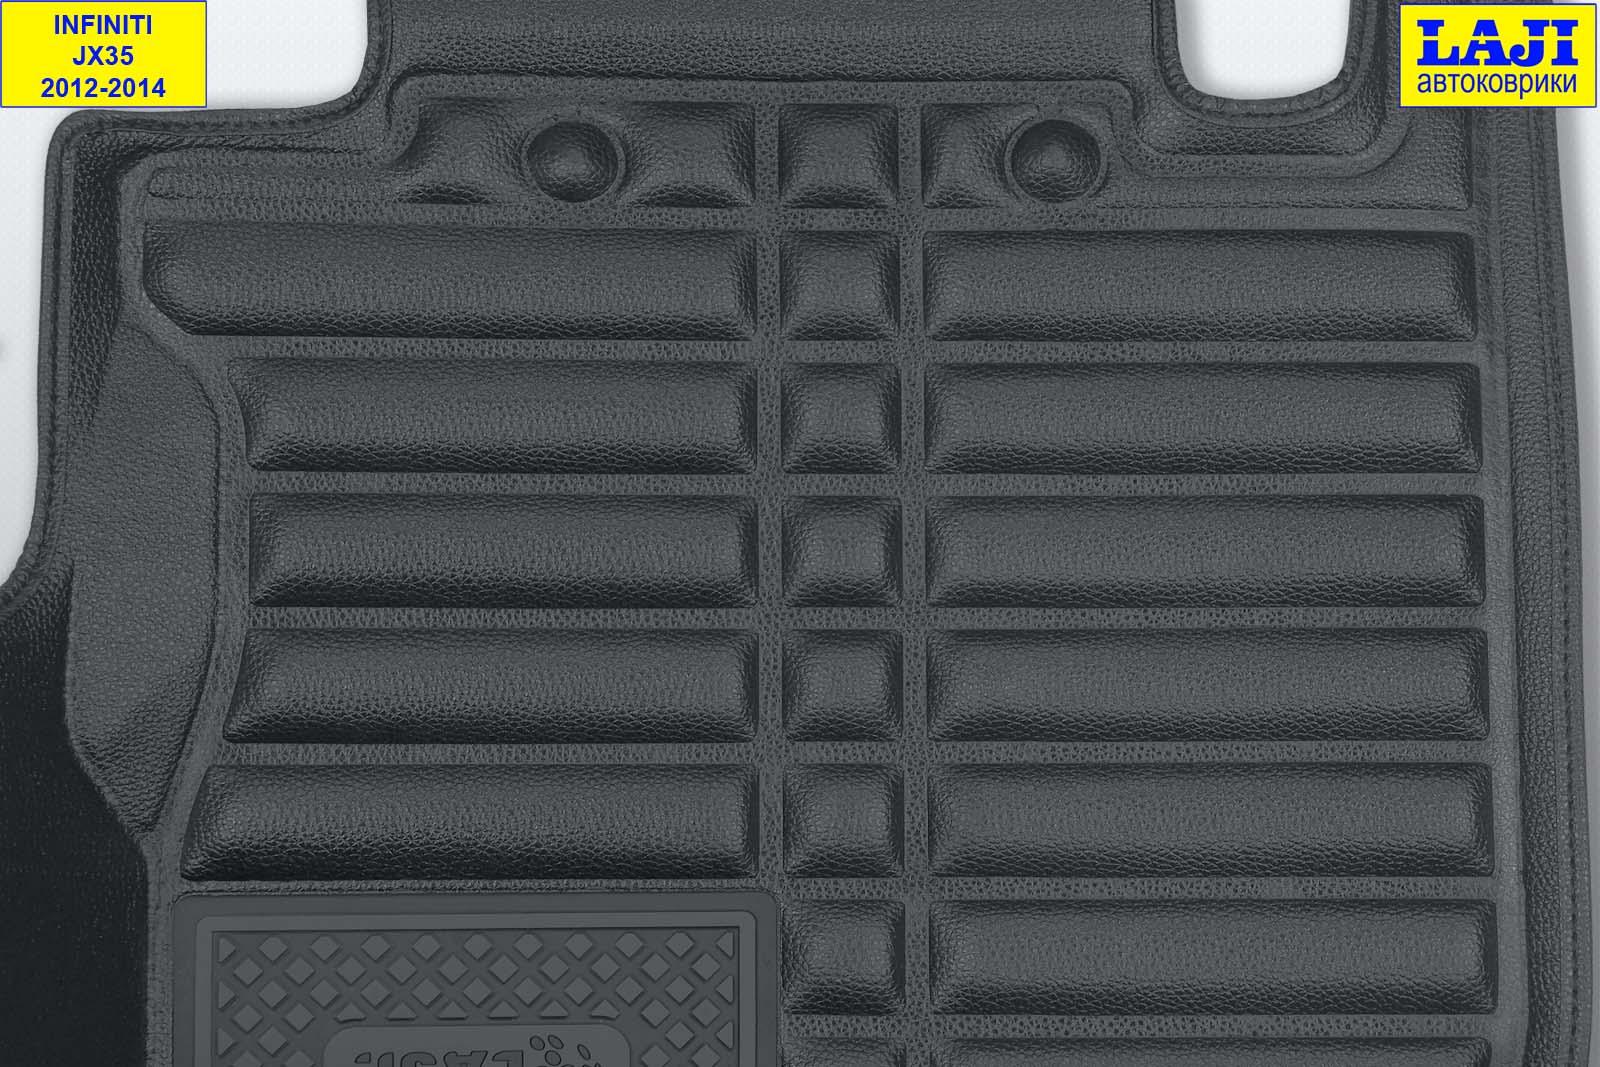 5D коврики в салон Infiniti JX35 2012-2014 8